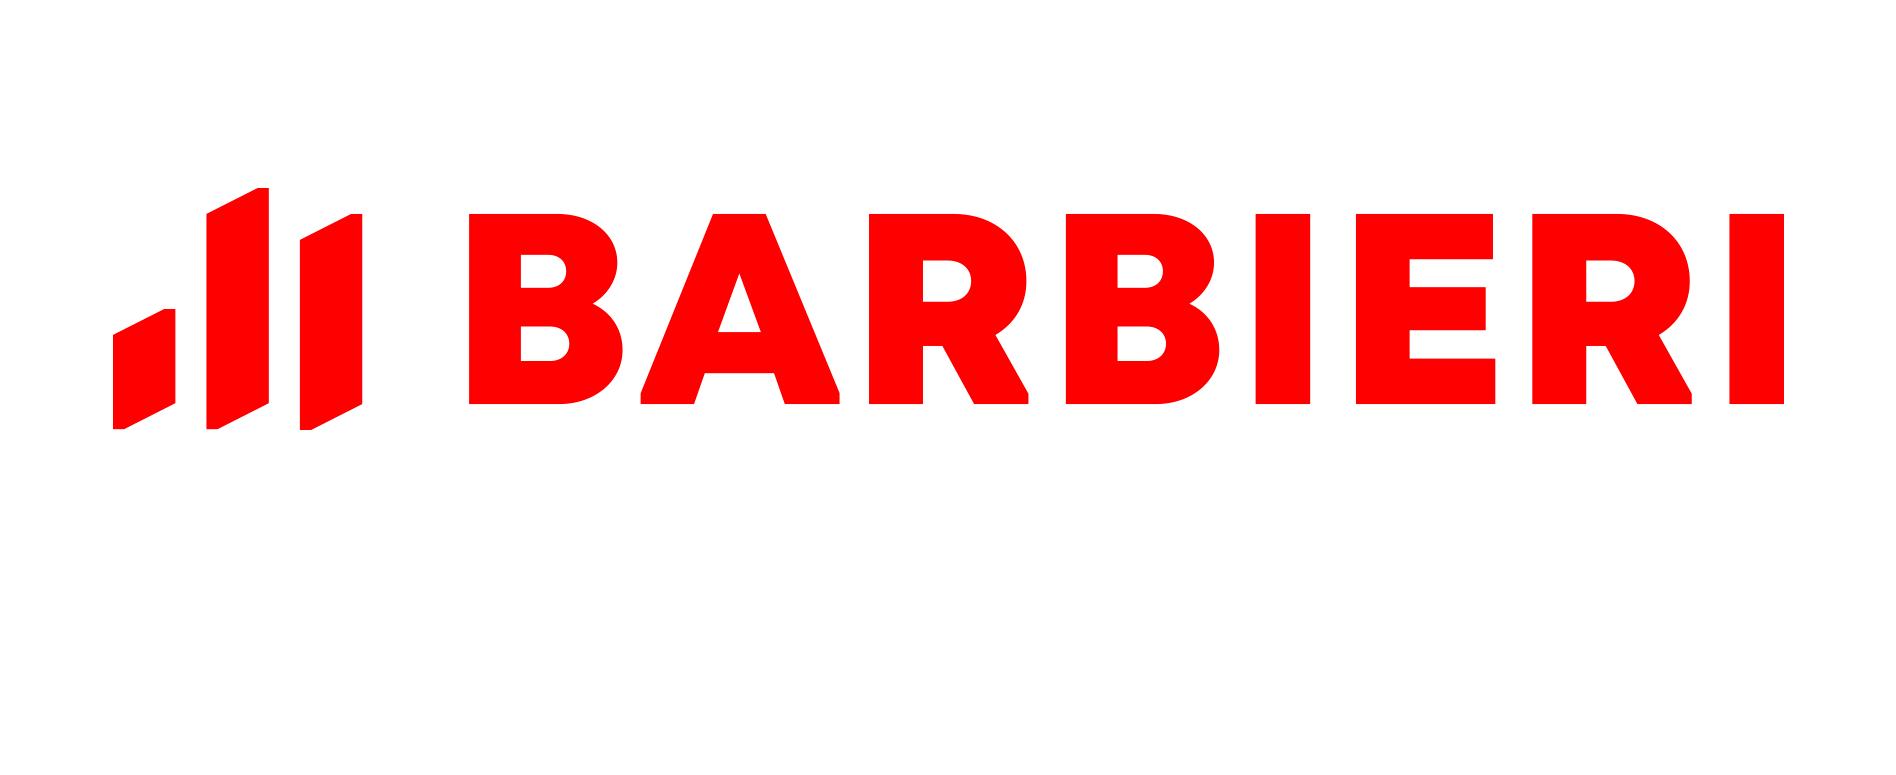 Blog de Barbieri Uruguay